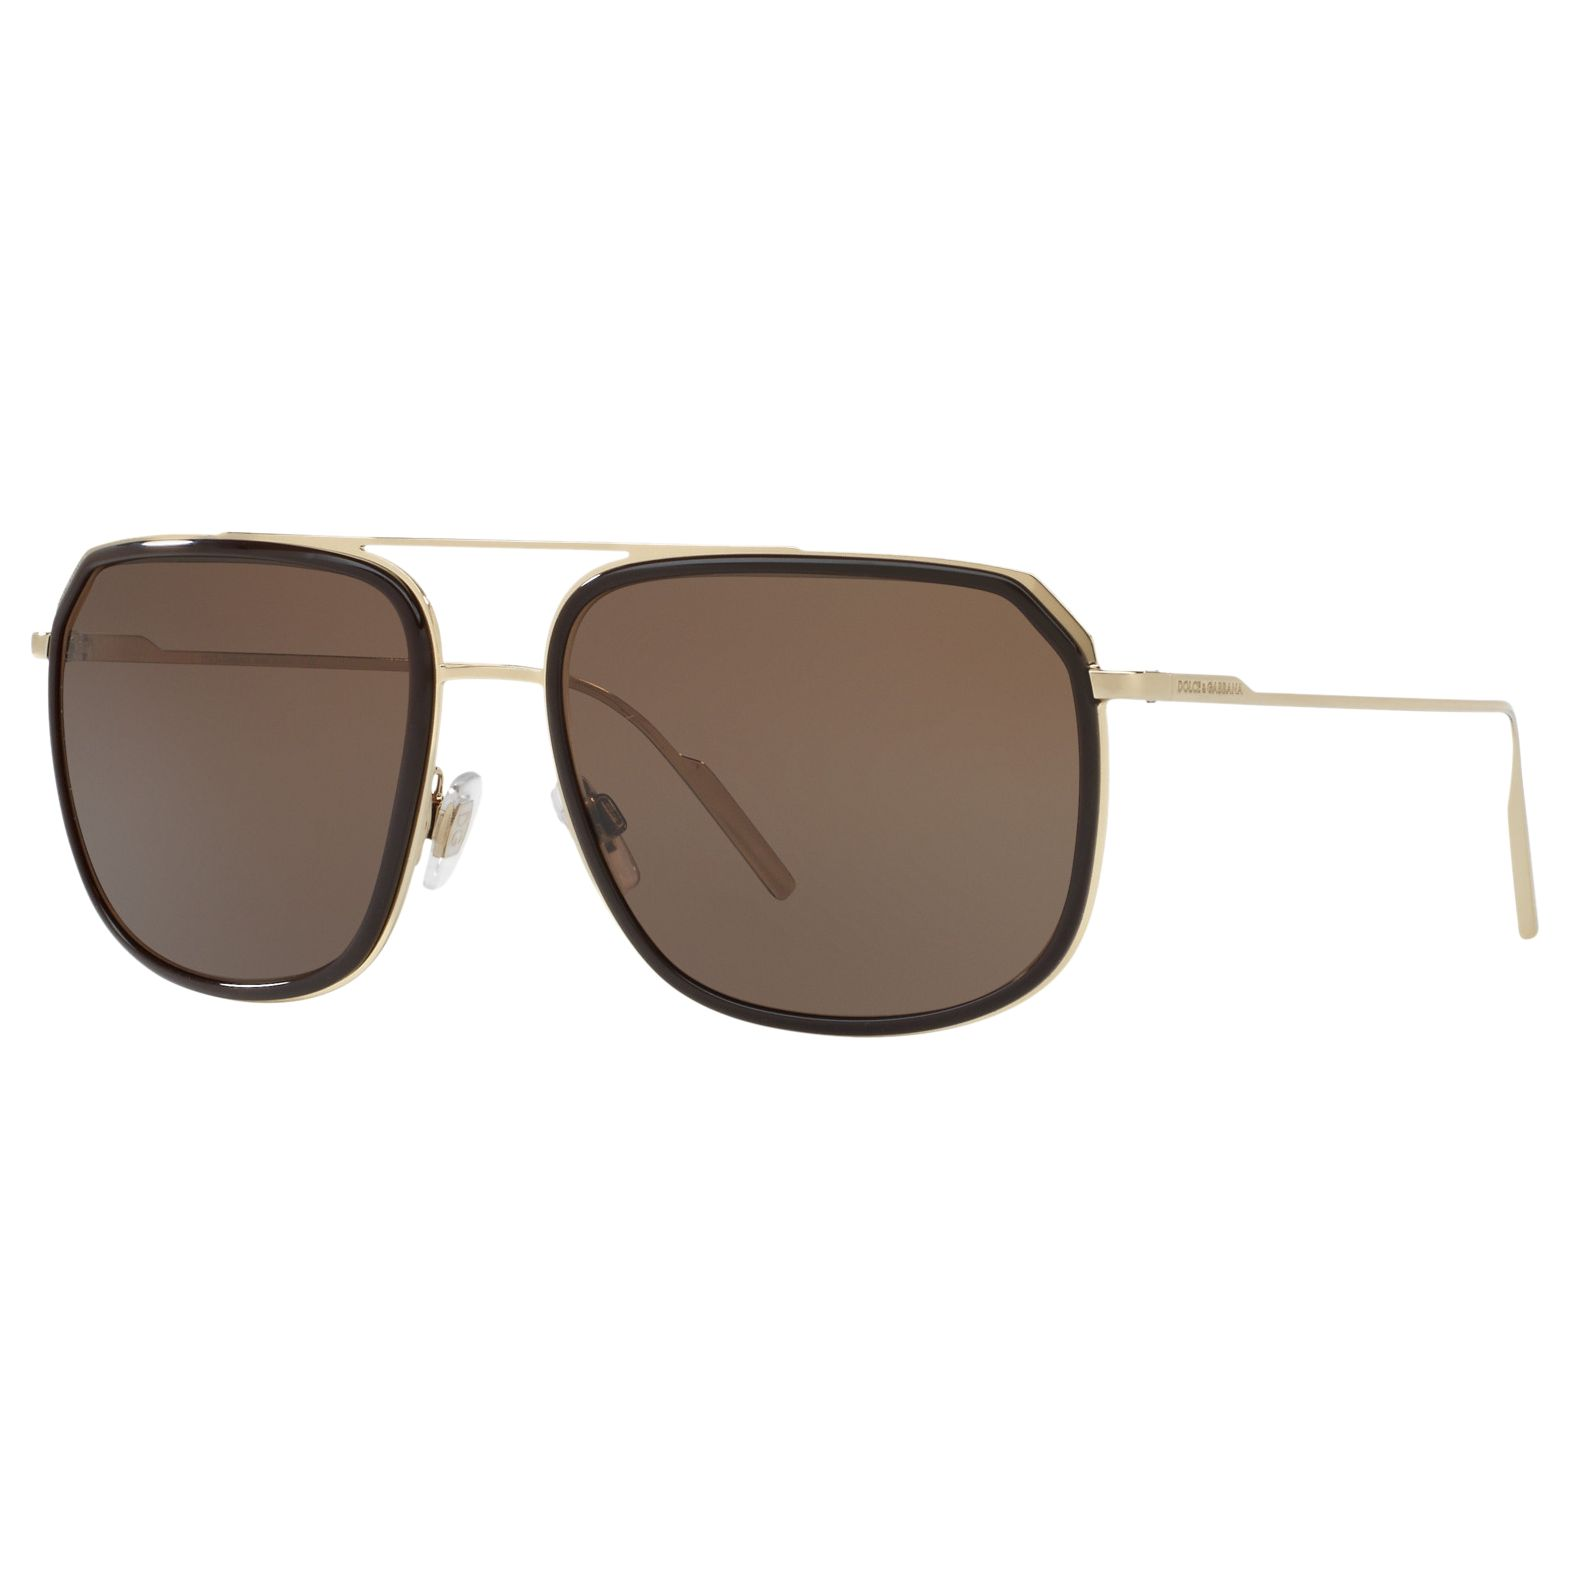 Dolce & Gabbana Dolce & Gabbana DG2165 Square Sunglasses